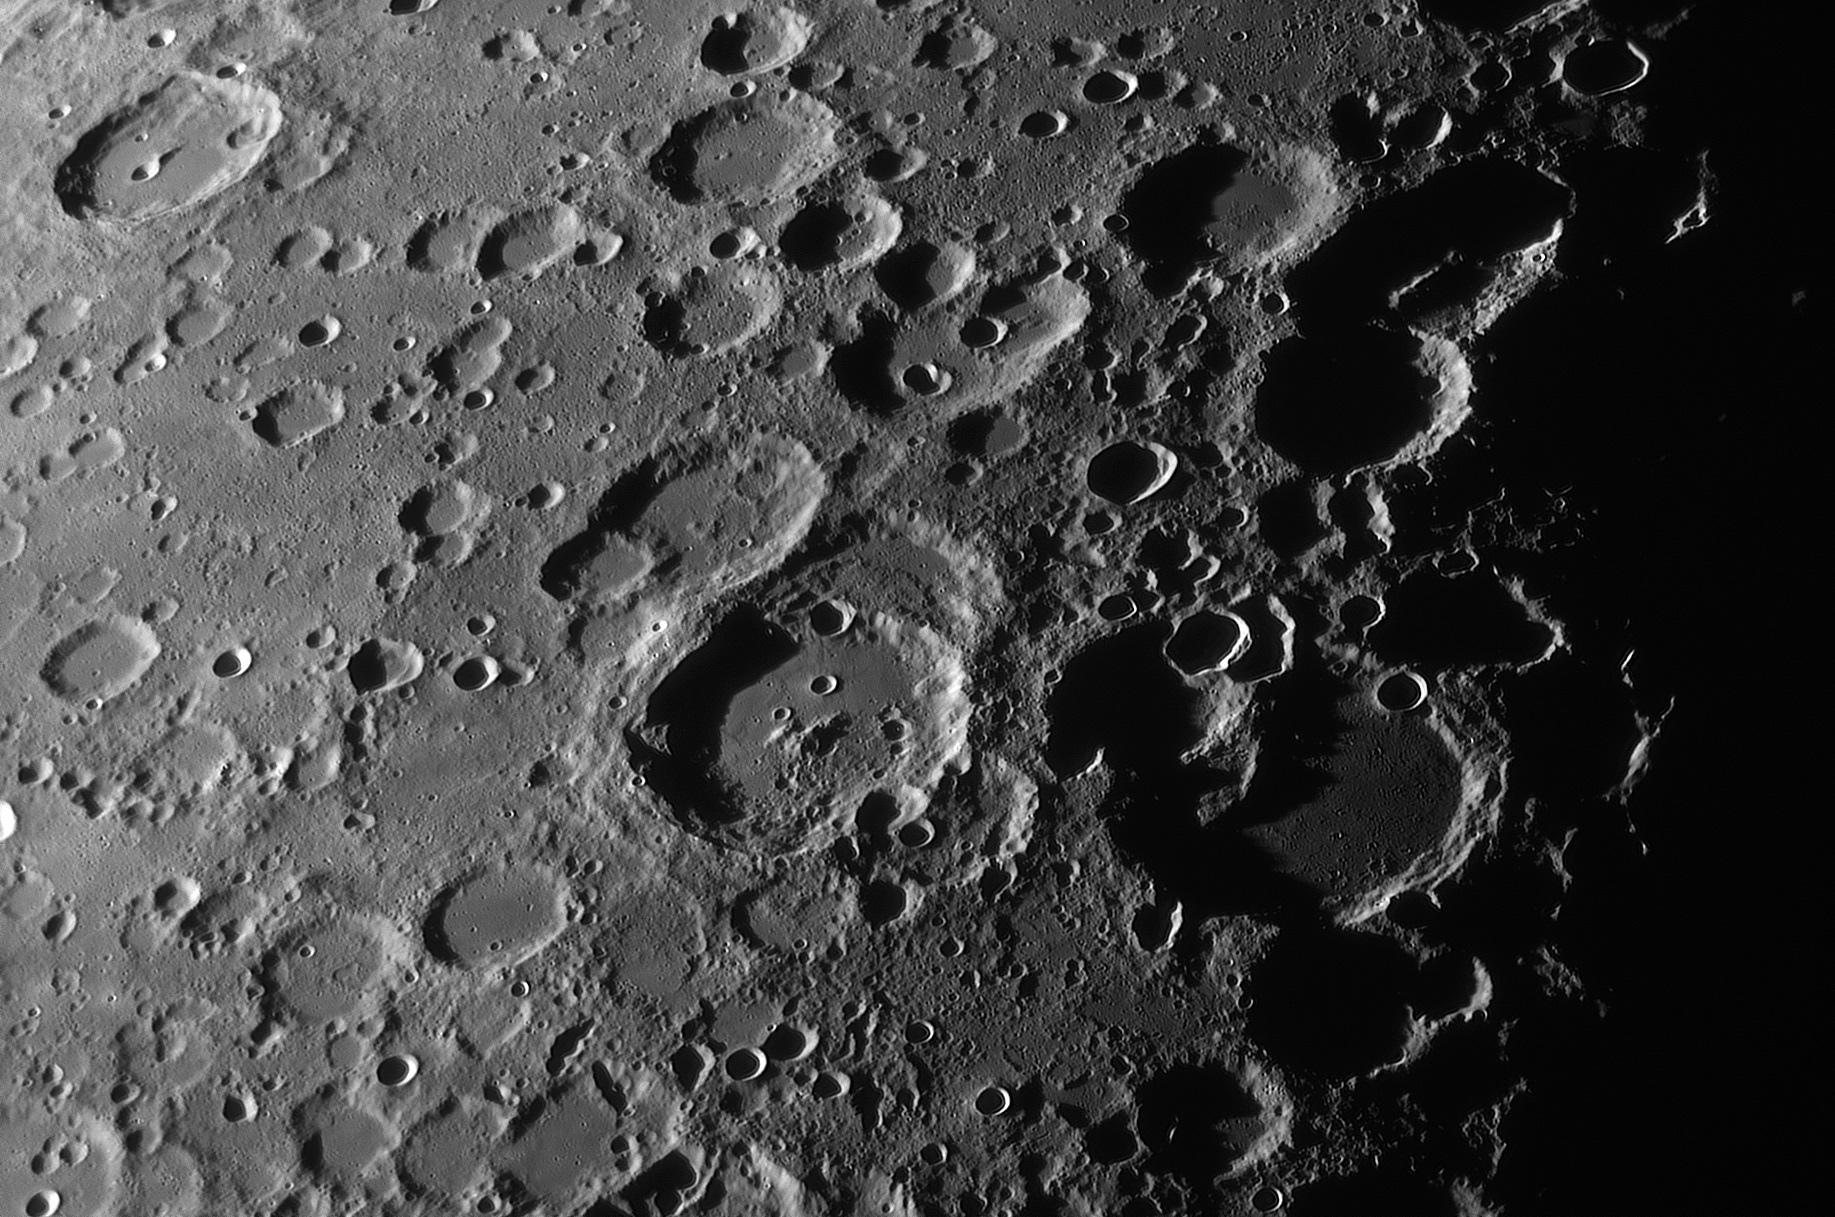 605749ec822c6_lune20mars211.jpg.7a3d7c63b8ffd694d0fb9ac1201eda8b.jpg